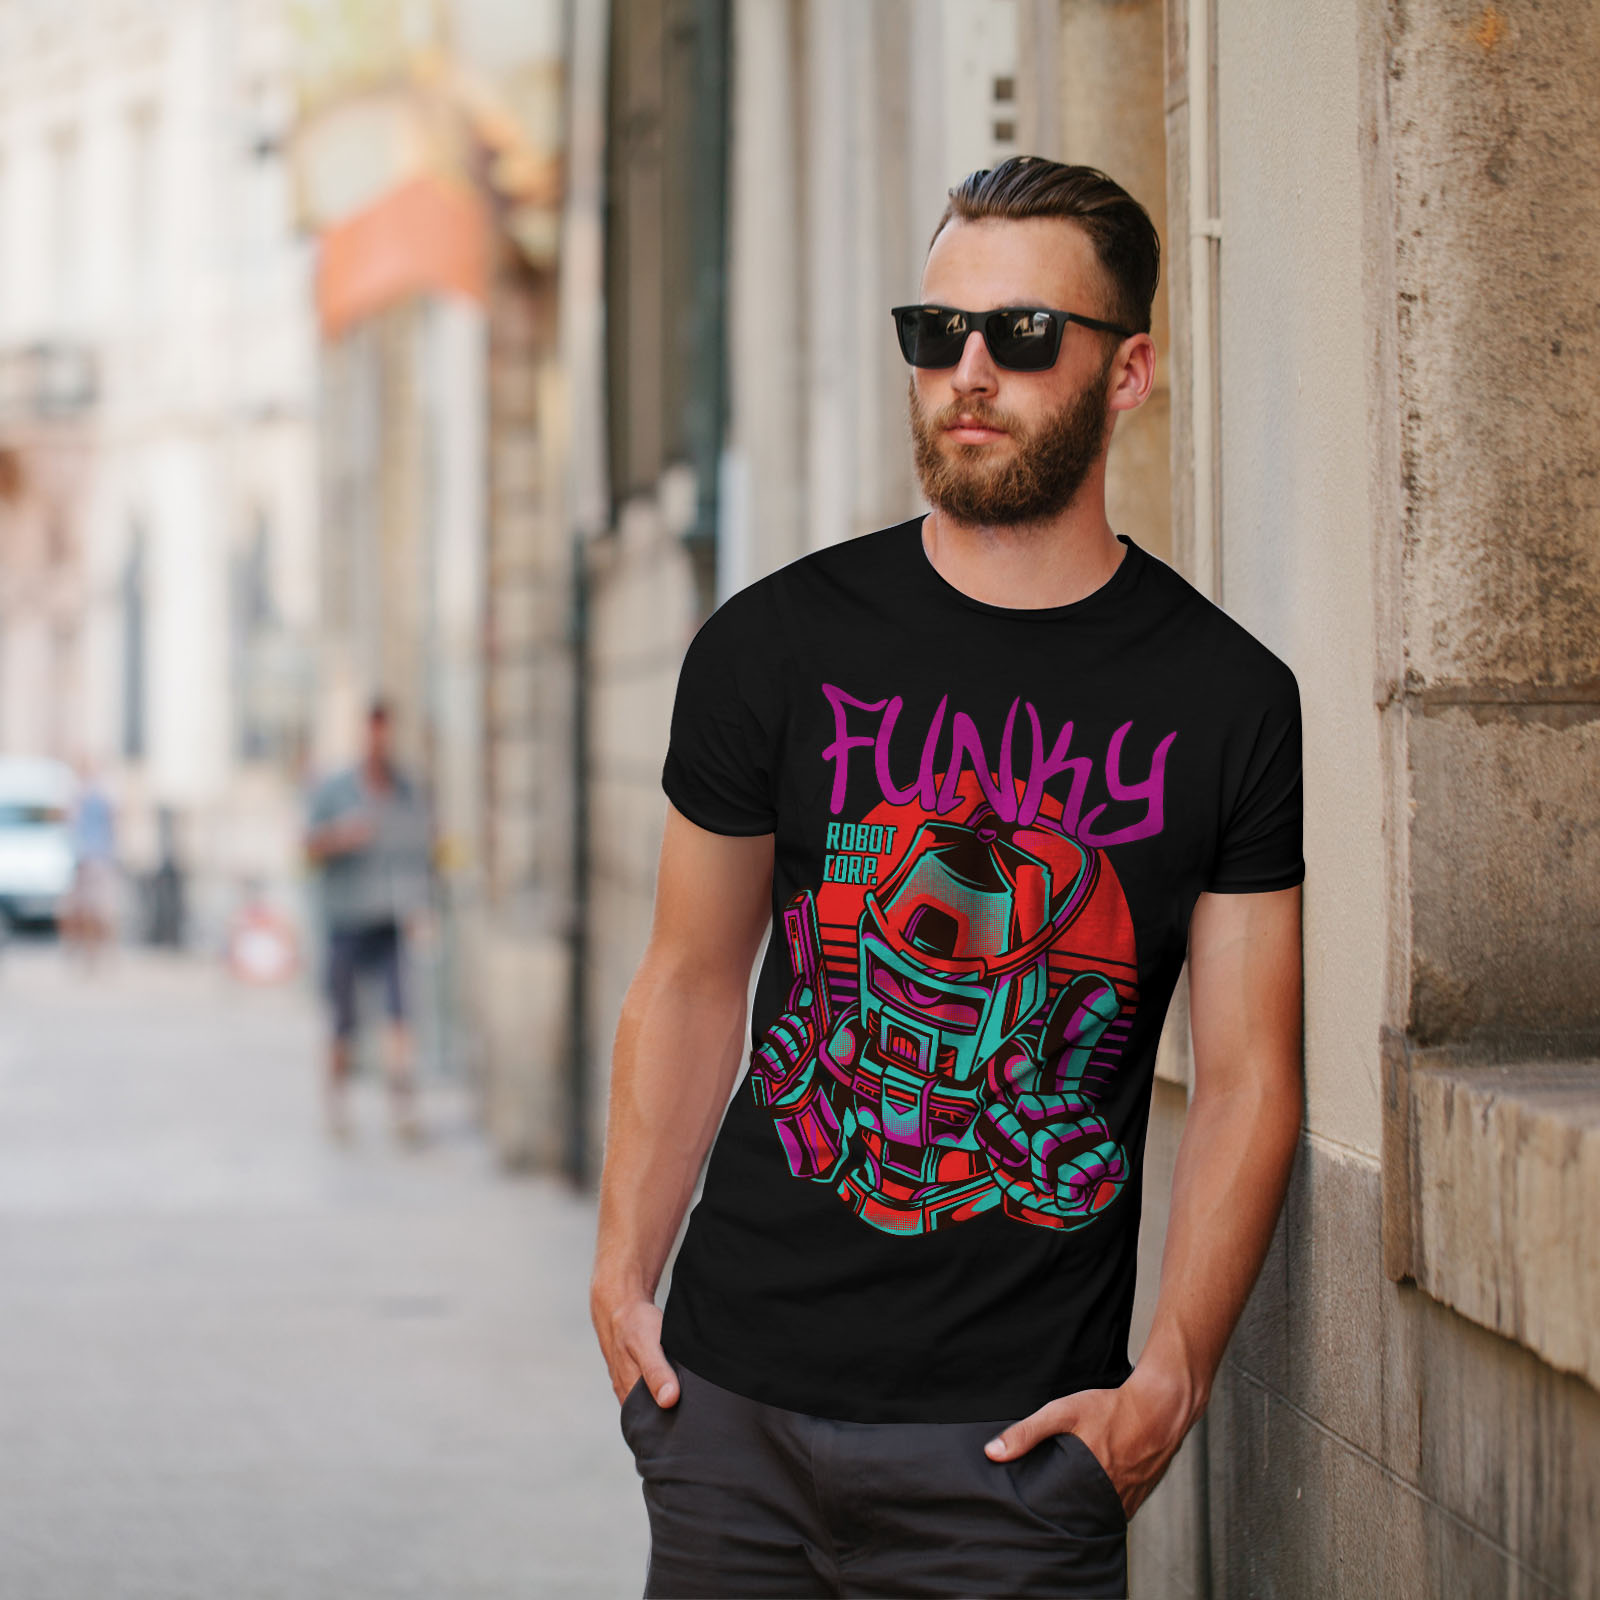 0 Graphic Design Stampato Tee Wellcoda Funky Robot Corp Moda Da Uomo T-shirt